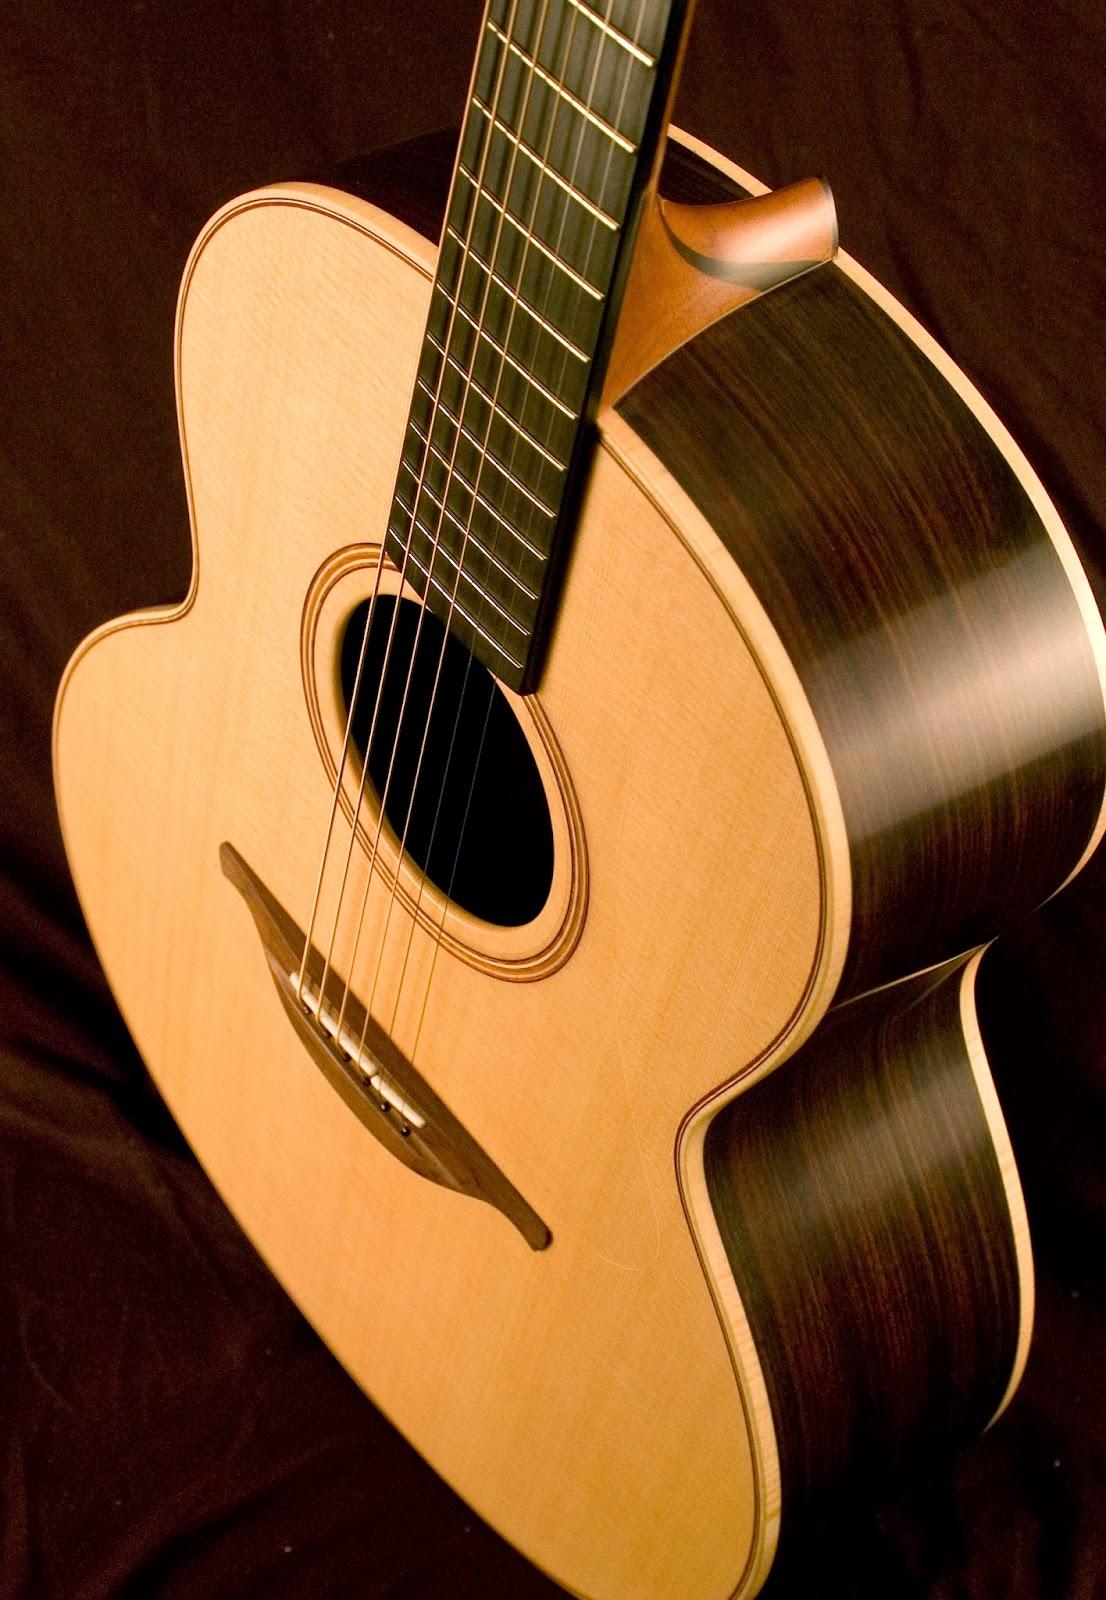 Electric Guitar vs. Acoustic Guitar Essay